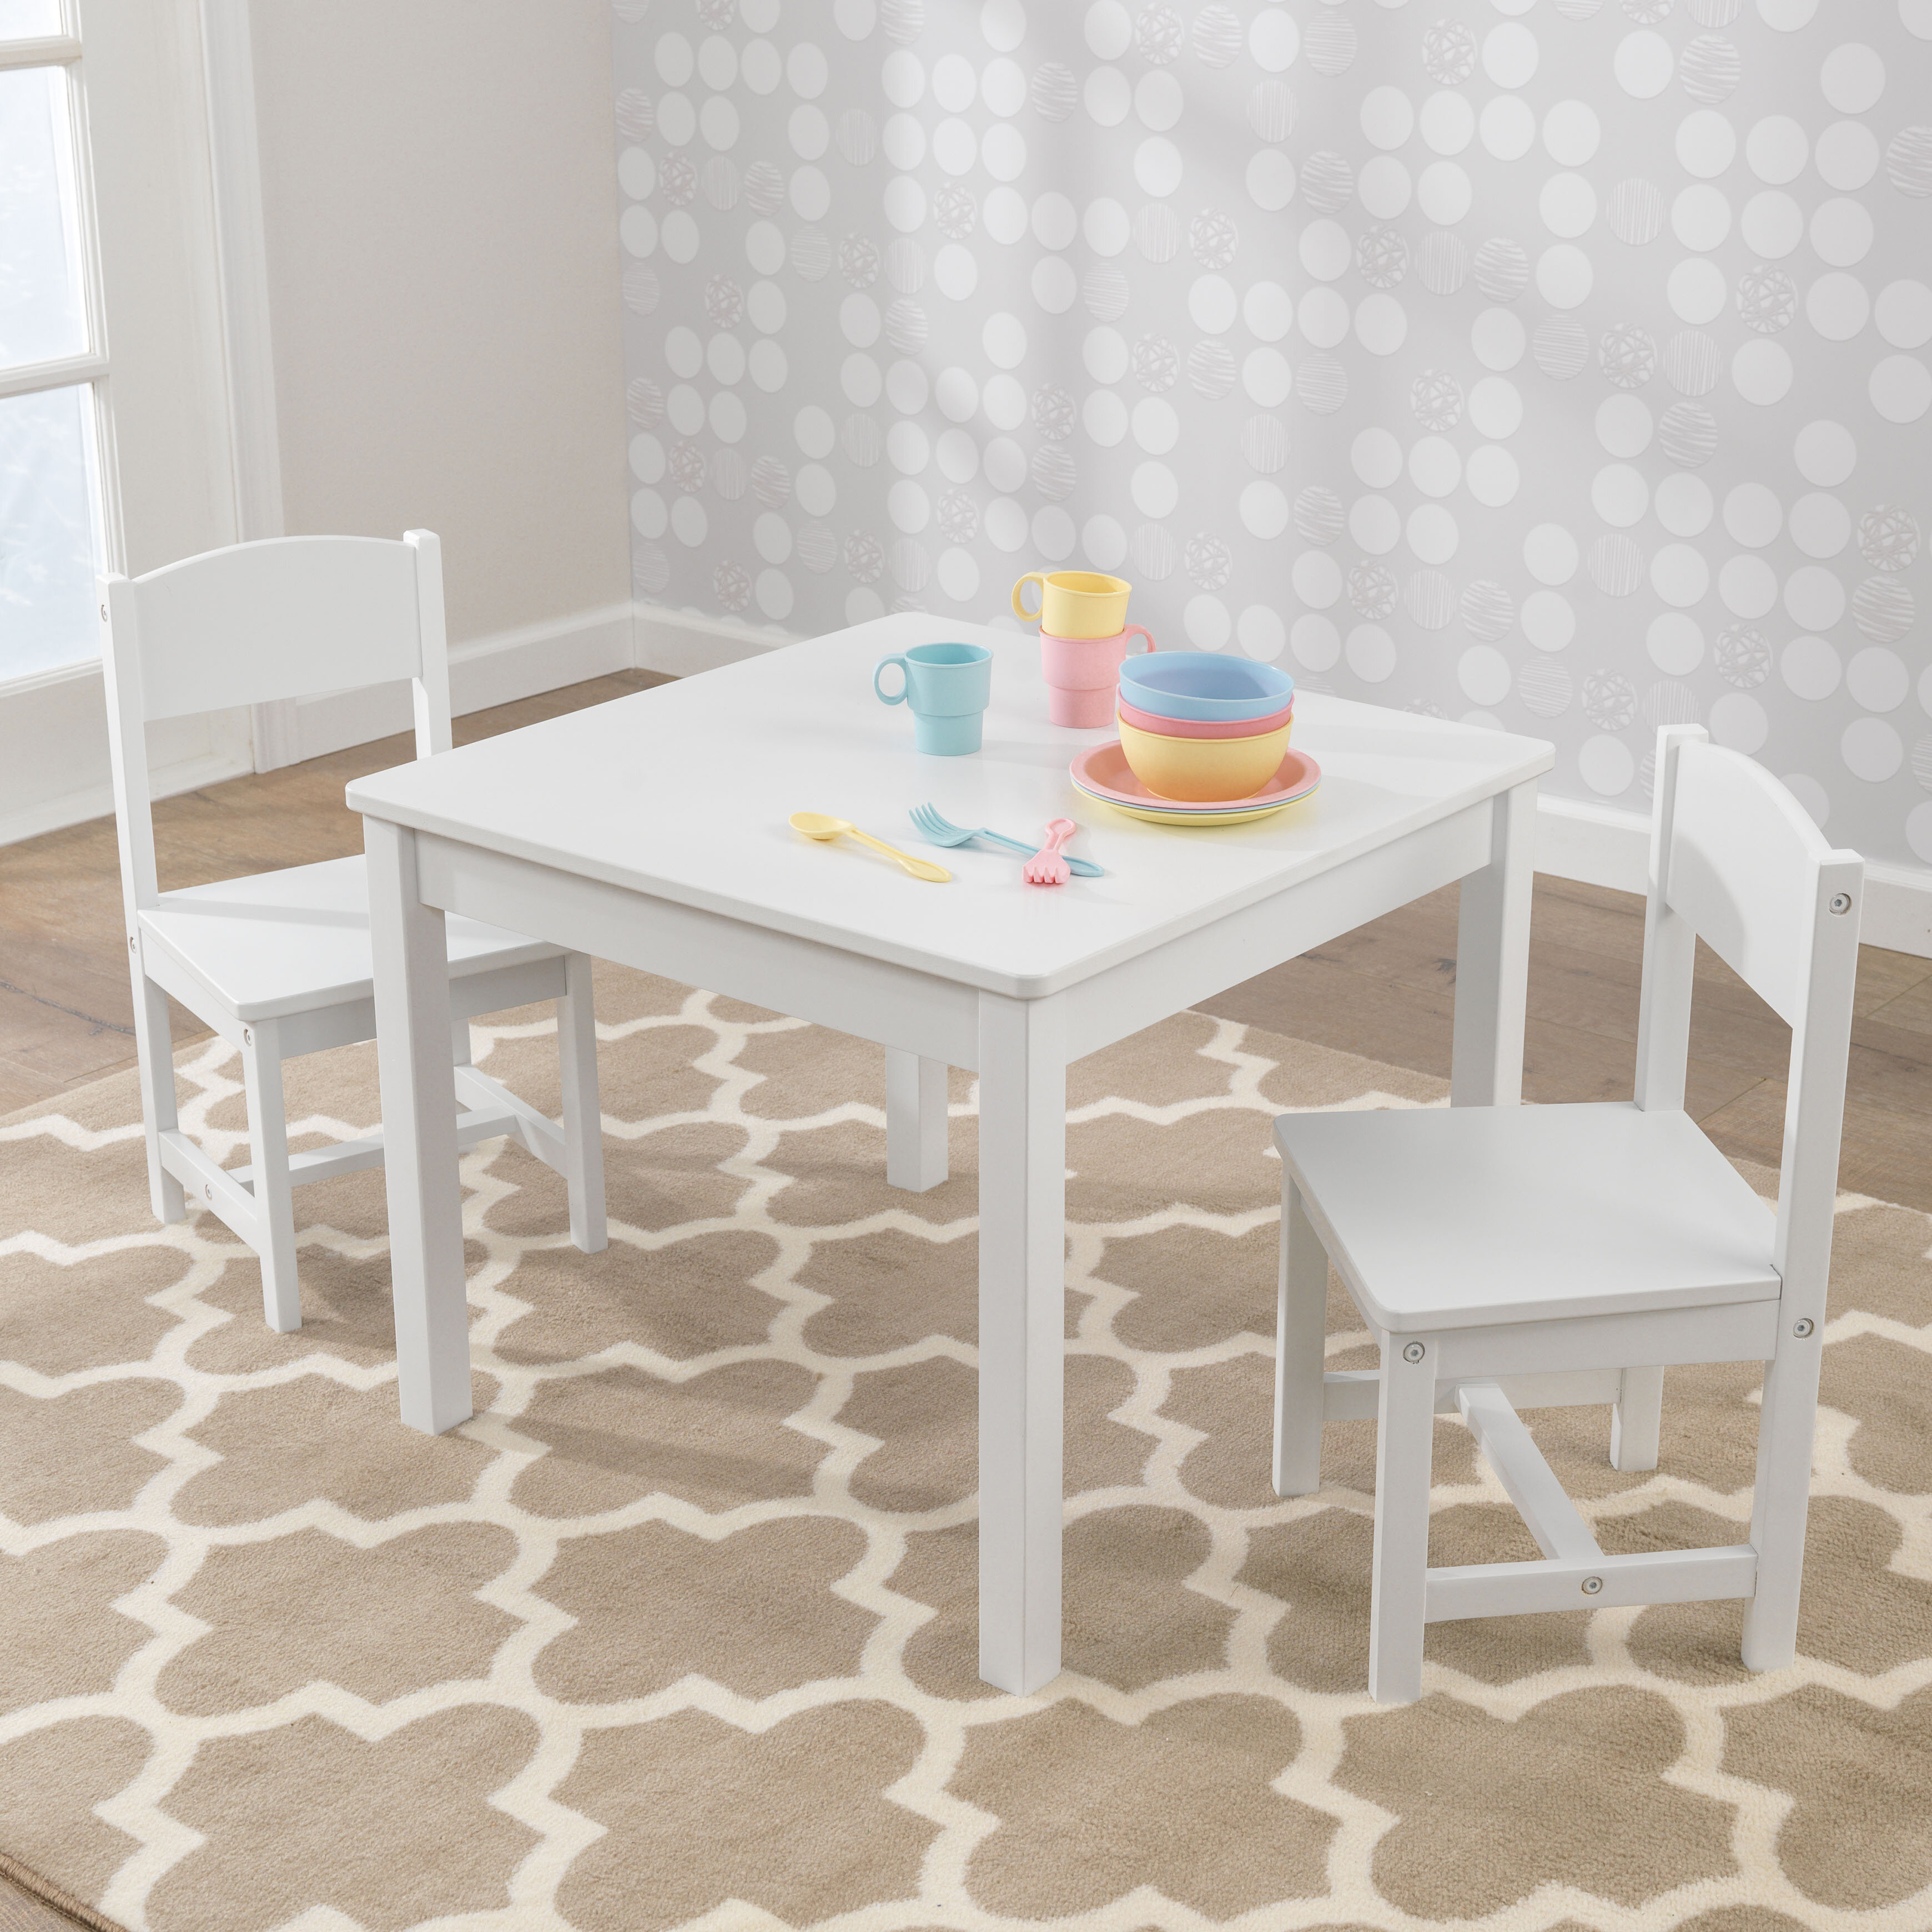 KidKraft Aspen Kids 3 Piece Table And Chair Set U0026 Reviews | Wayfair